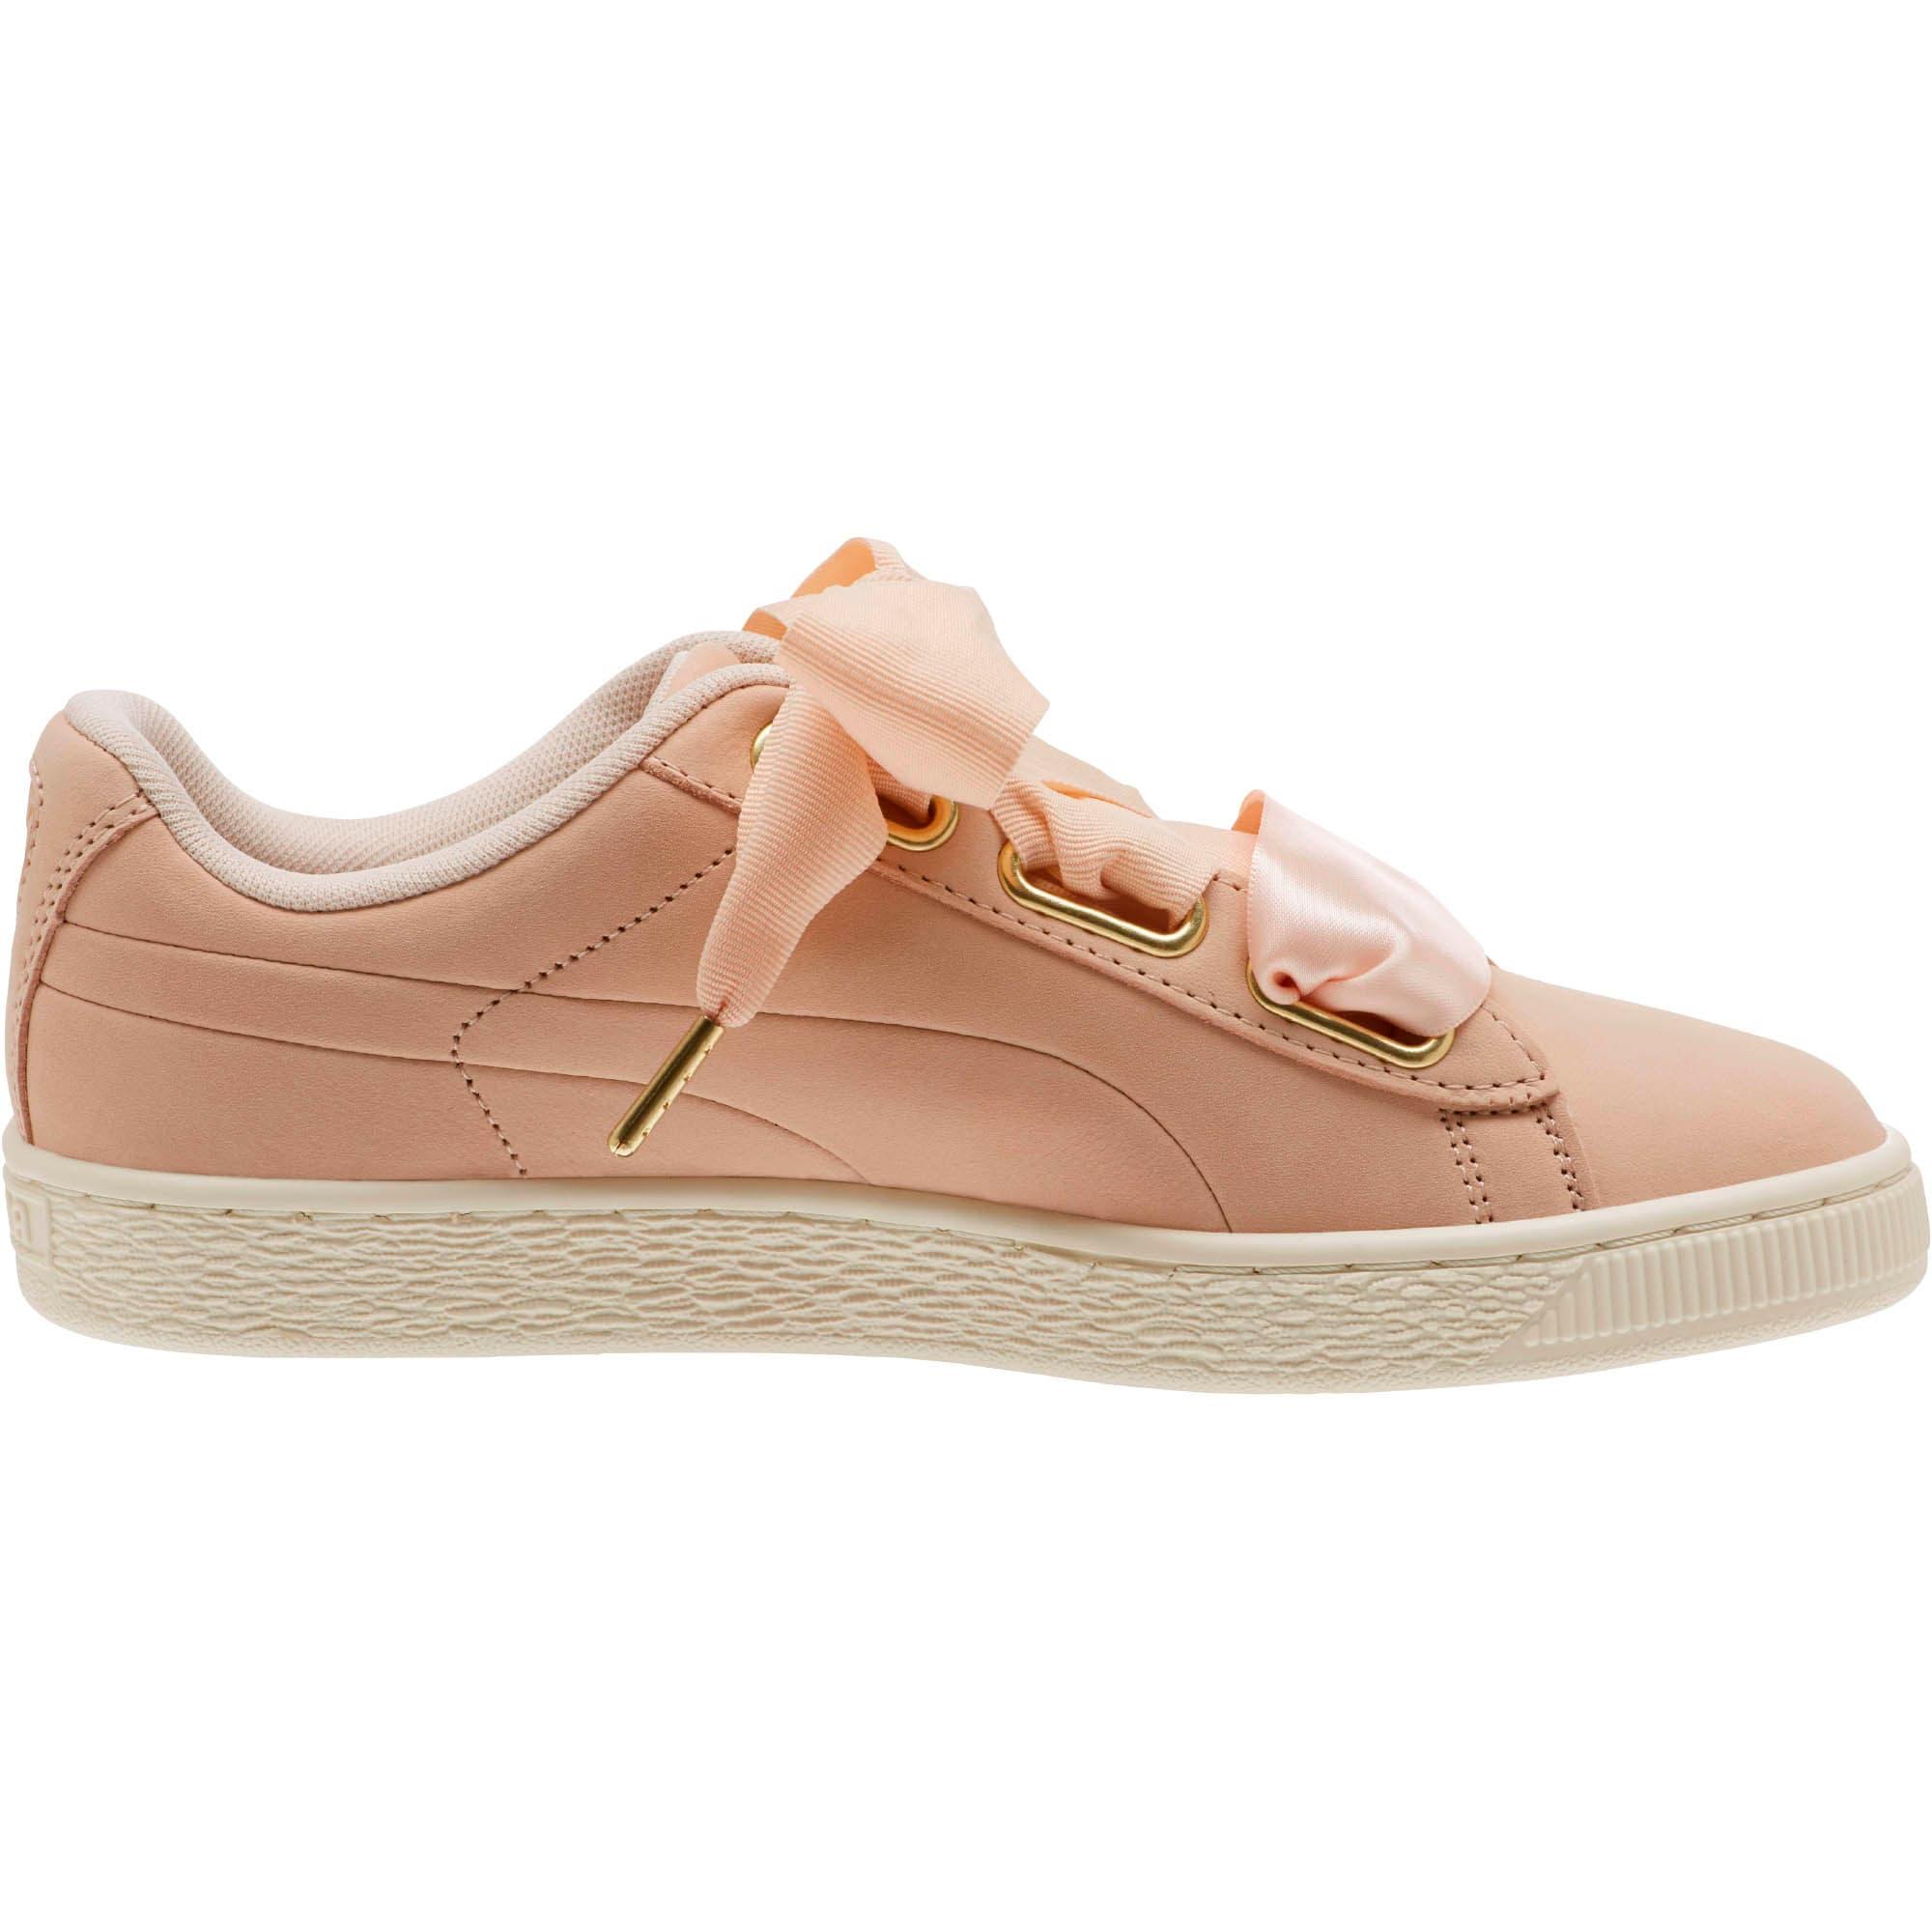 Thumbnail 2 of Basket Heart Soft Women's Sneakers, Cream Tan-Marshmallow, medium